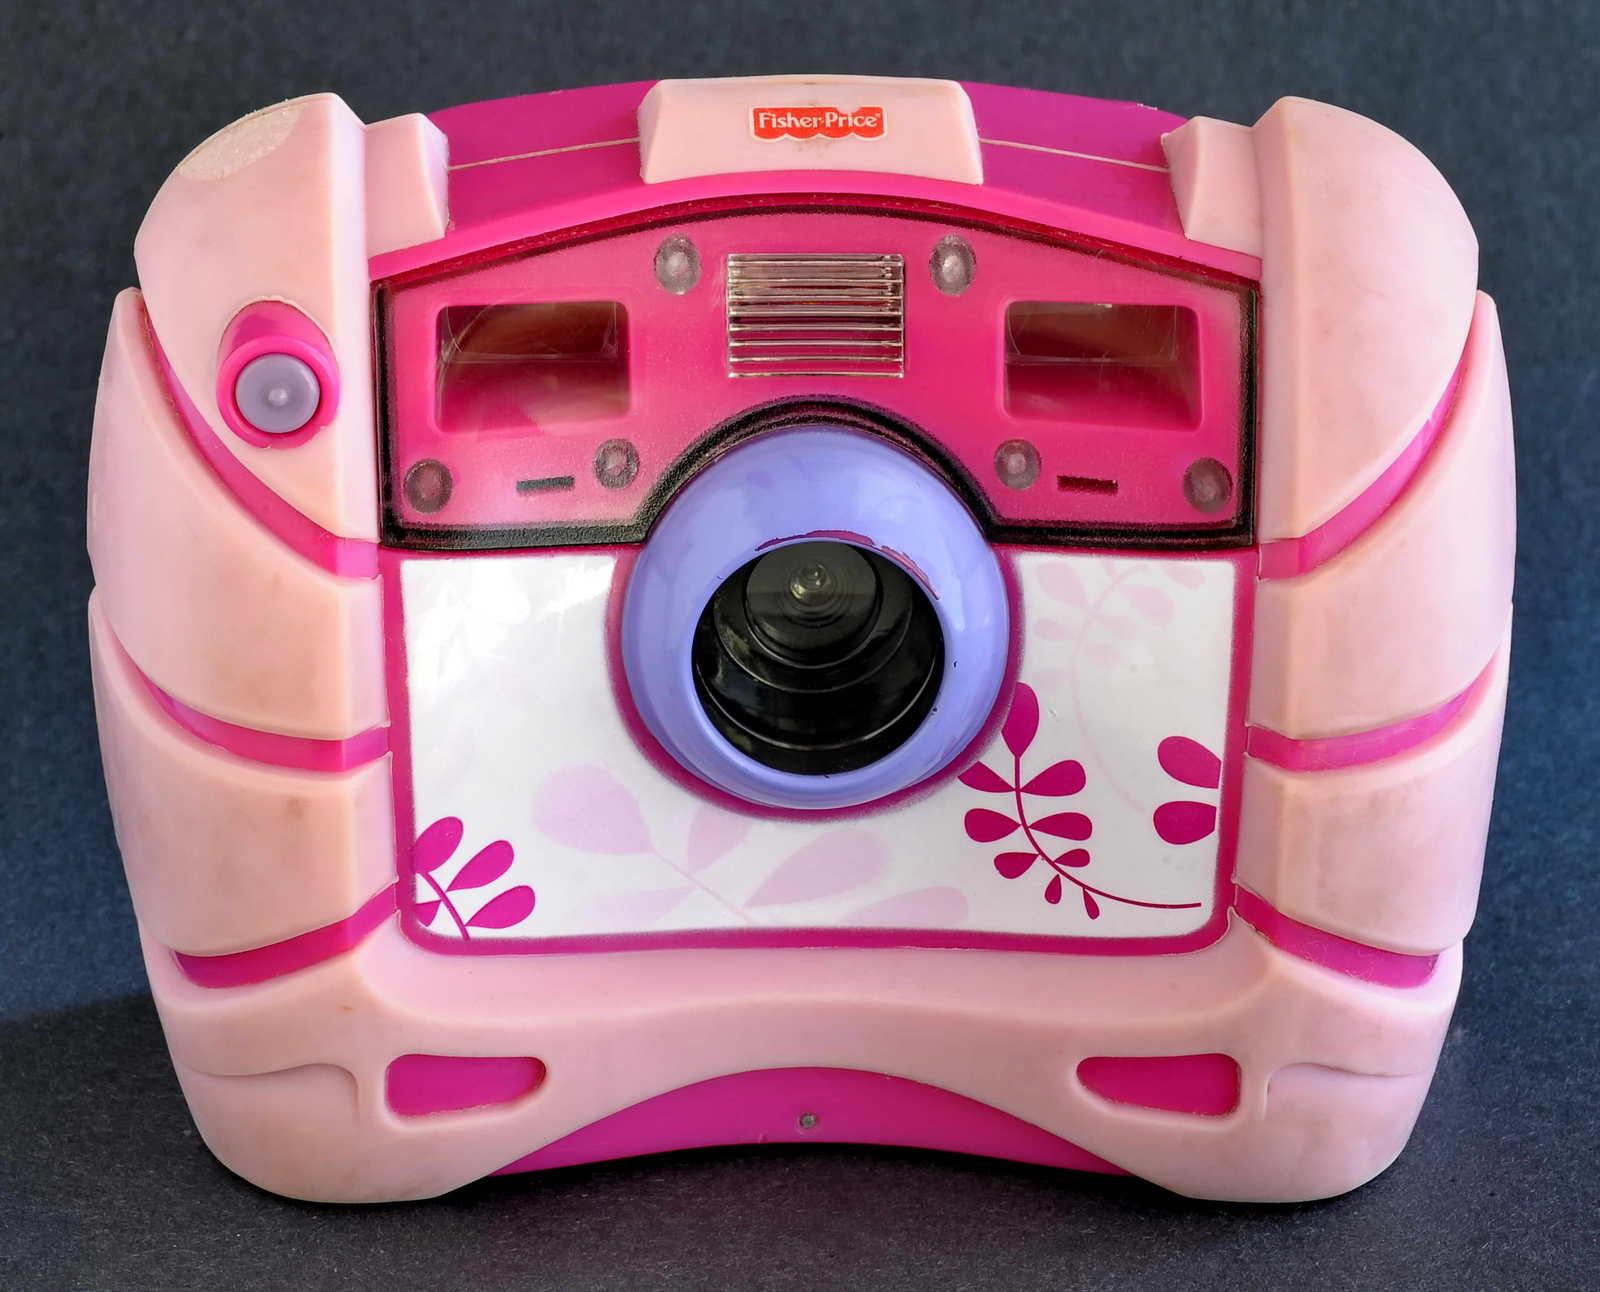 fisher price digital camera m8071 m8072 and 50 similar items rh bonanza com Fisher-Price Camera Batteries Fisher-Price Camera Batteries